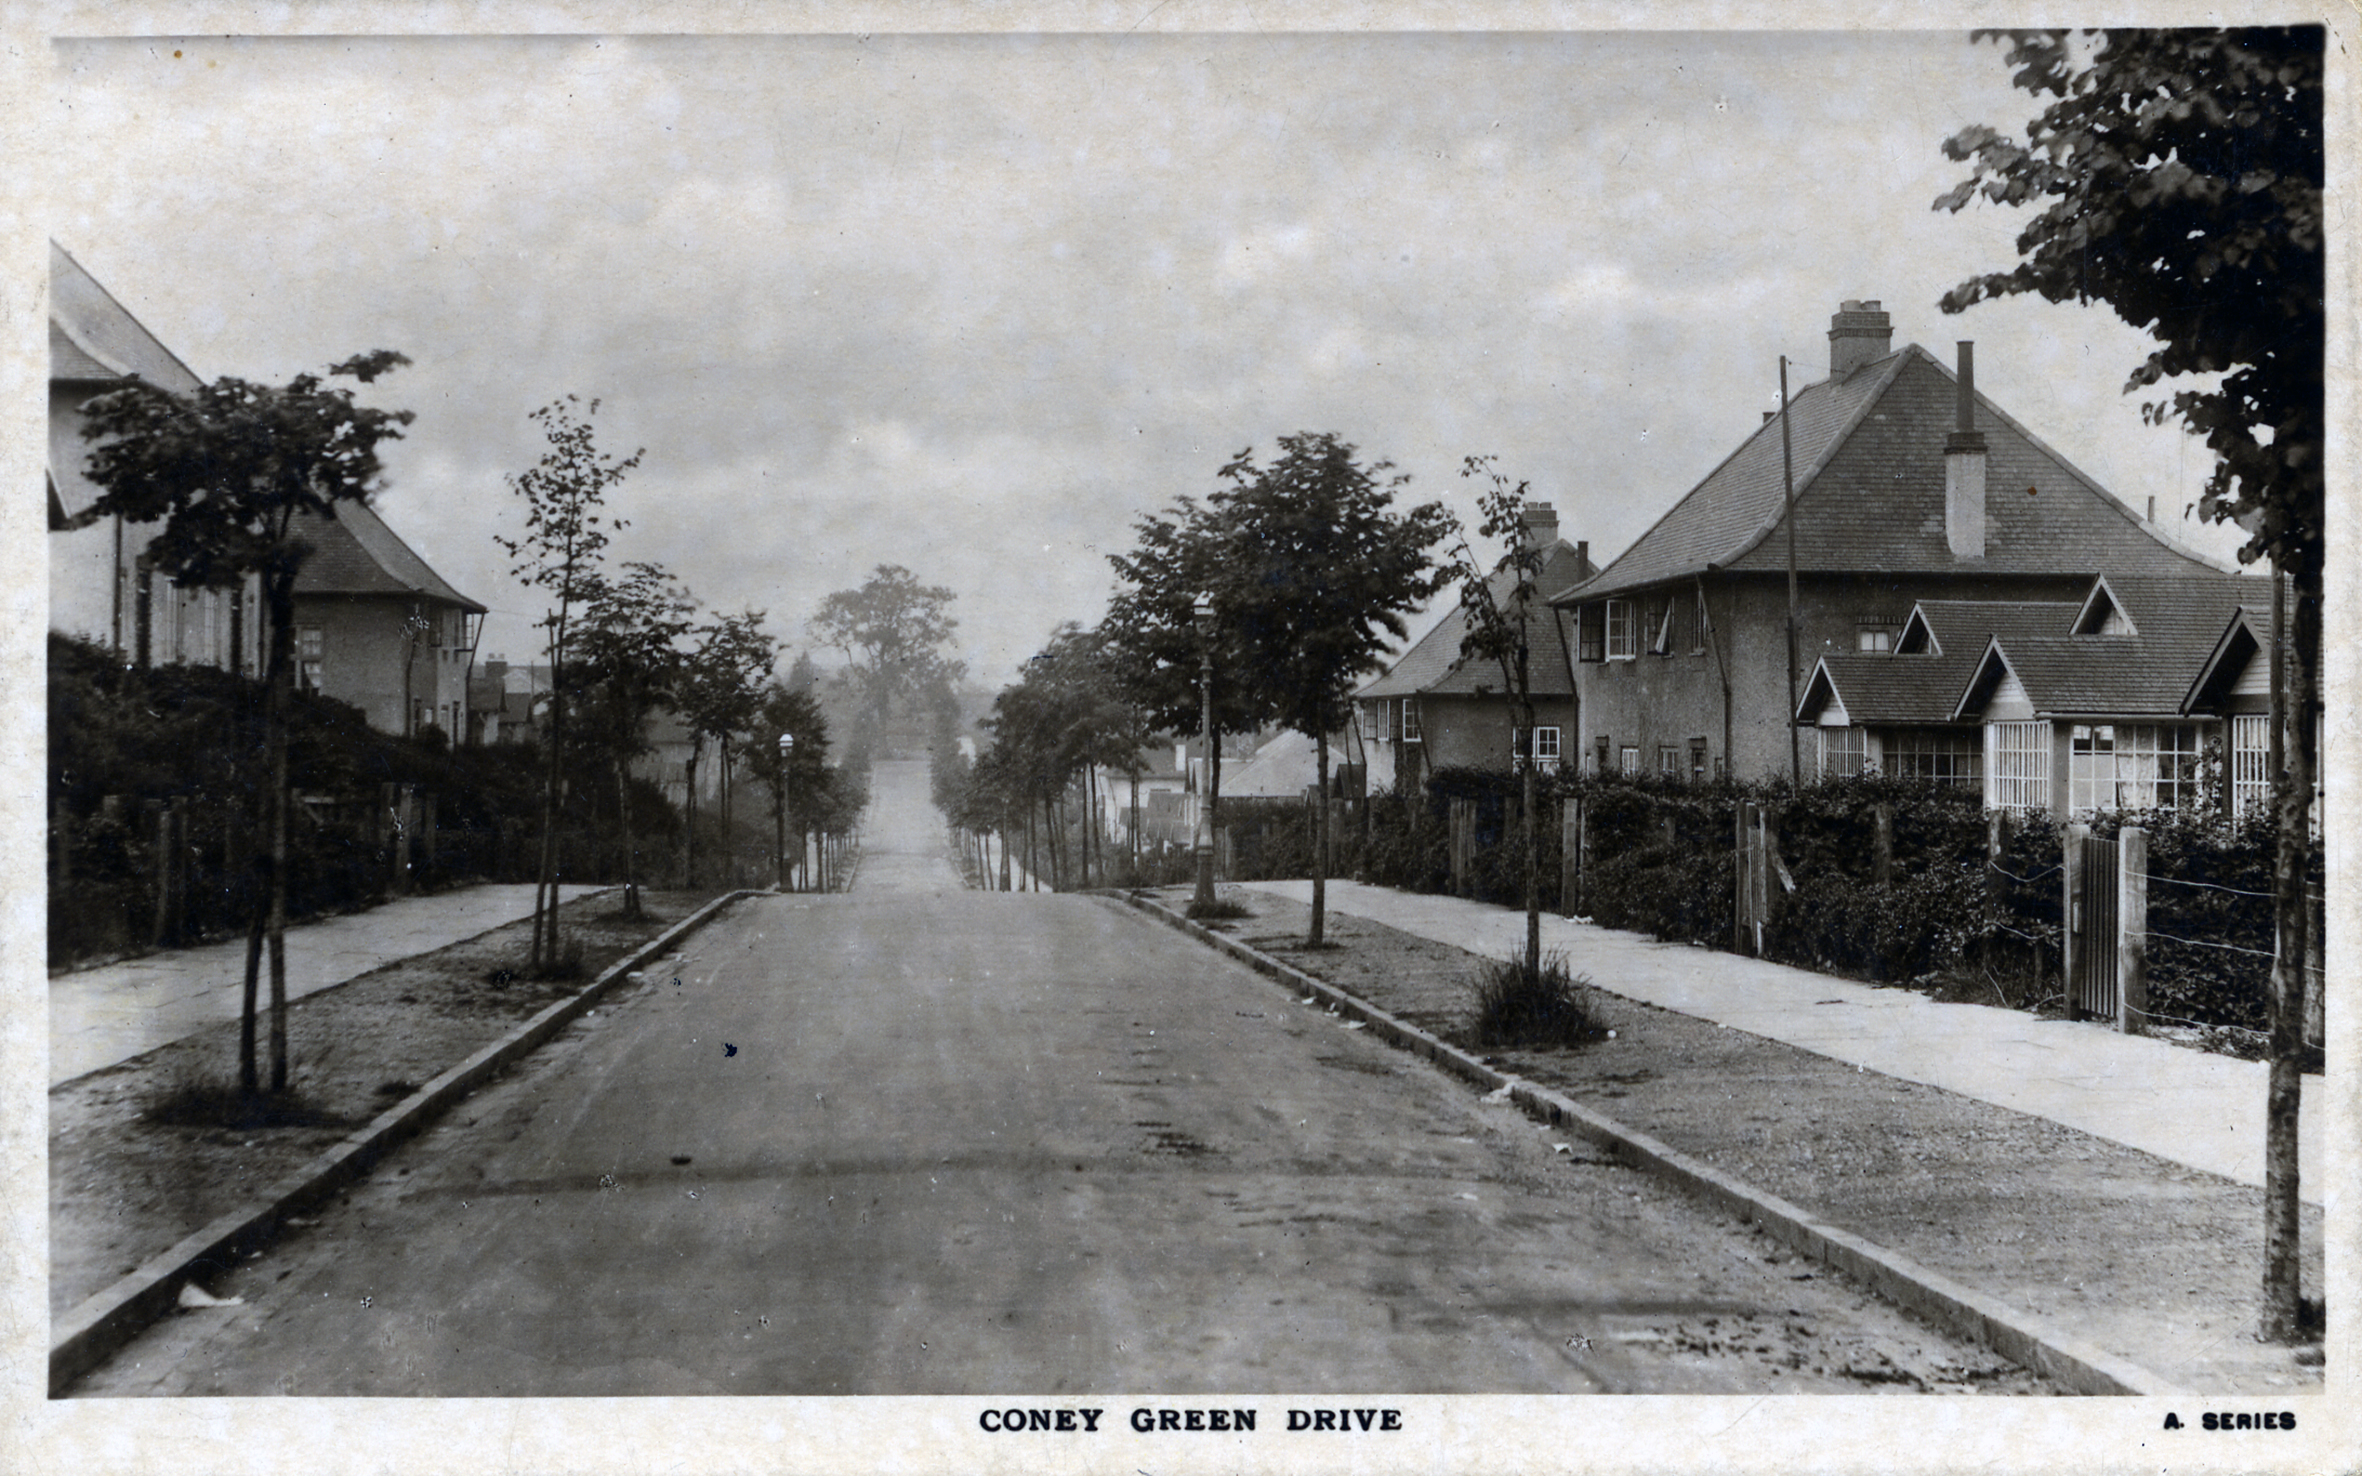 Coney Green Drive, 1920's